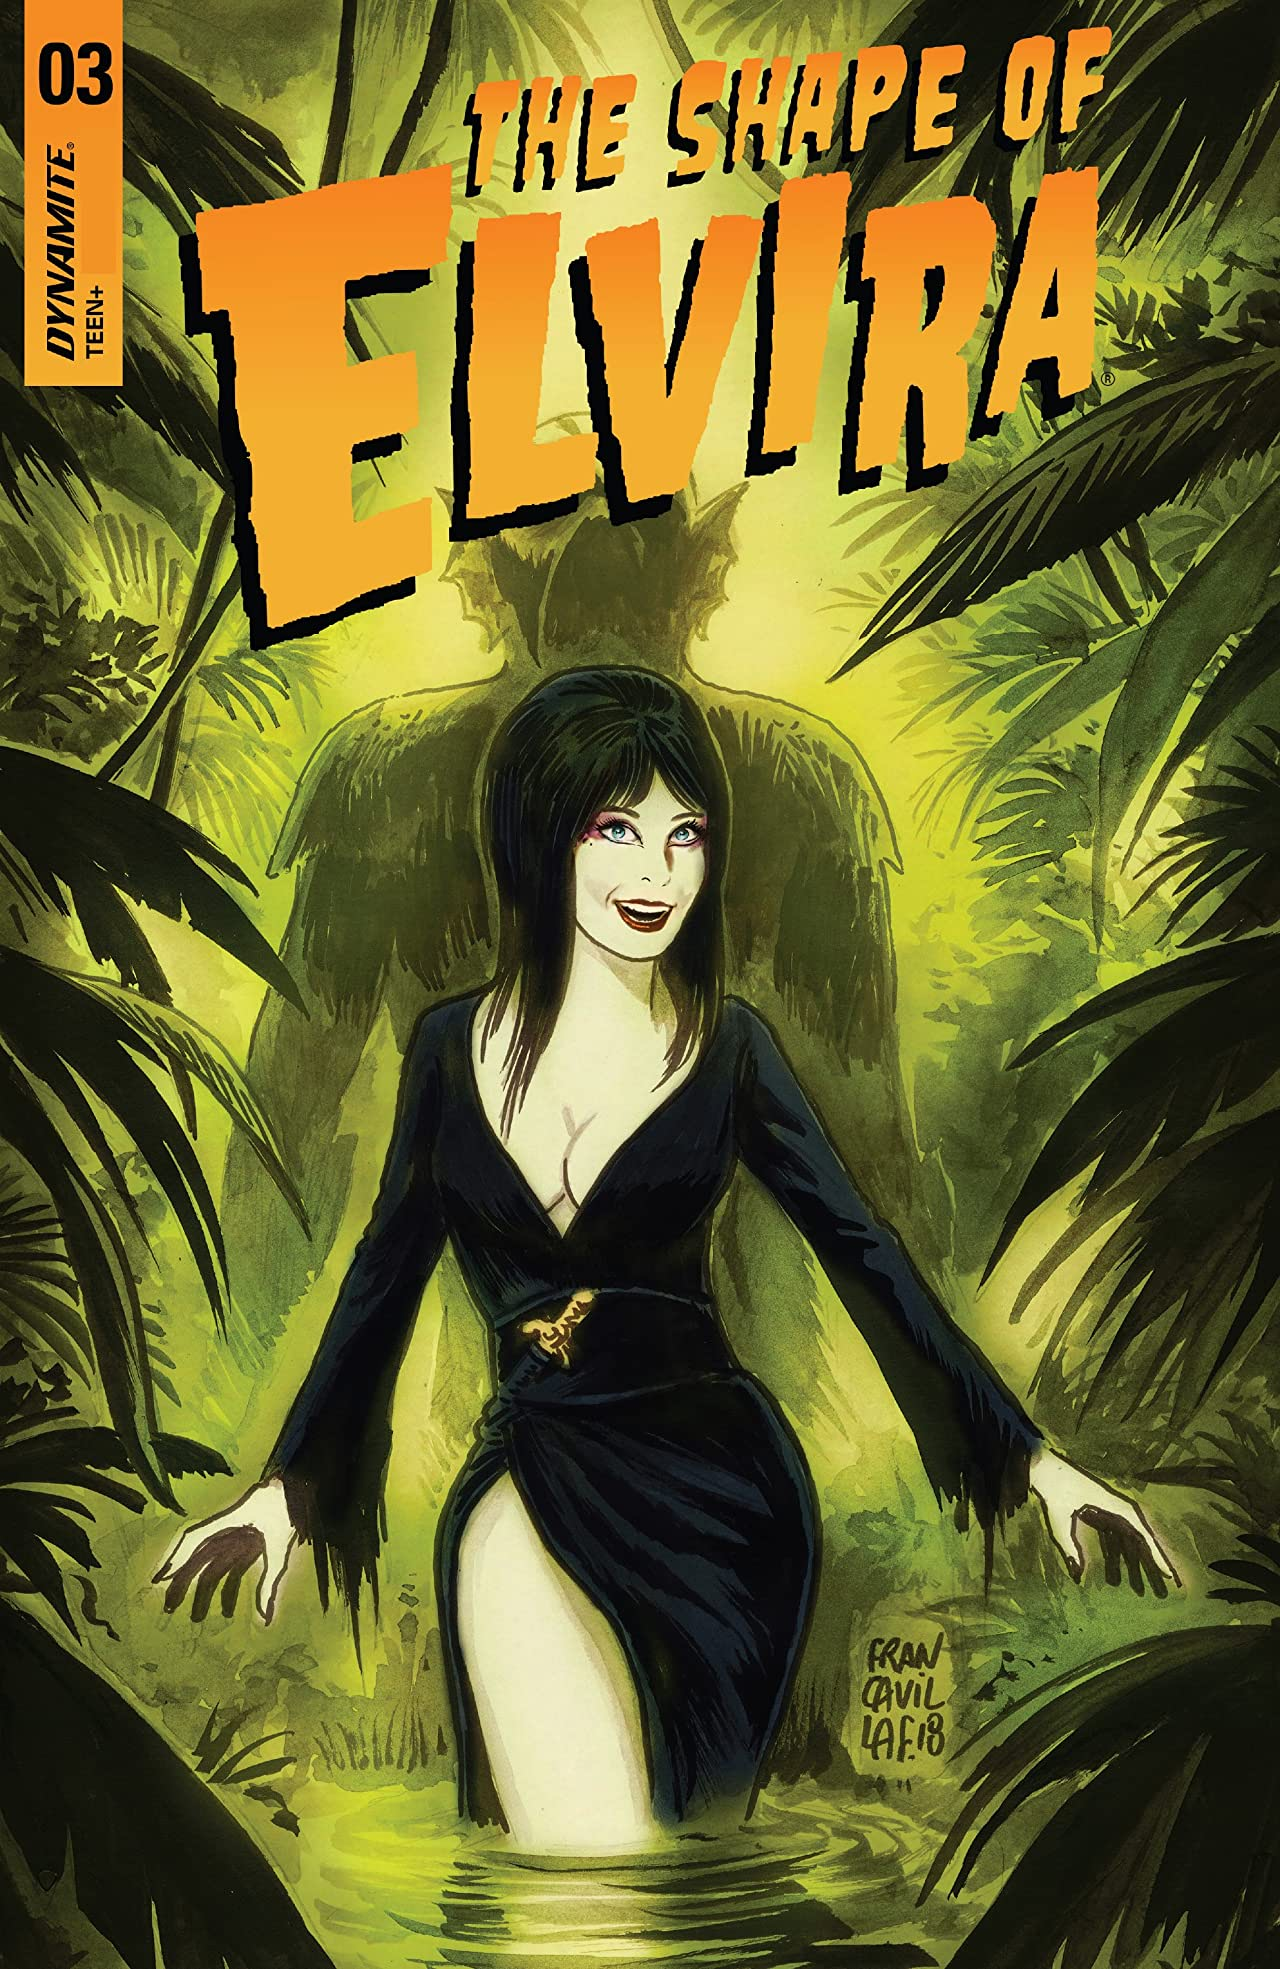 Elvira: The Shape of Elvira #3